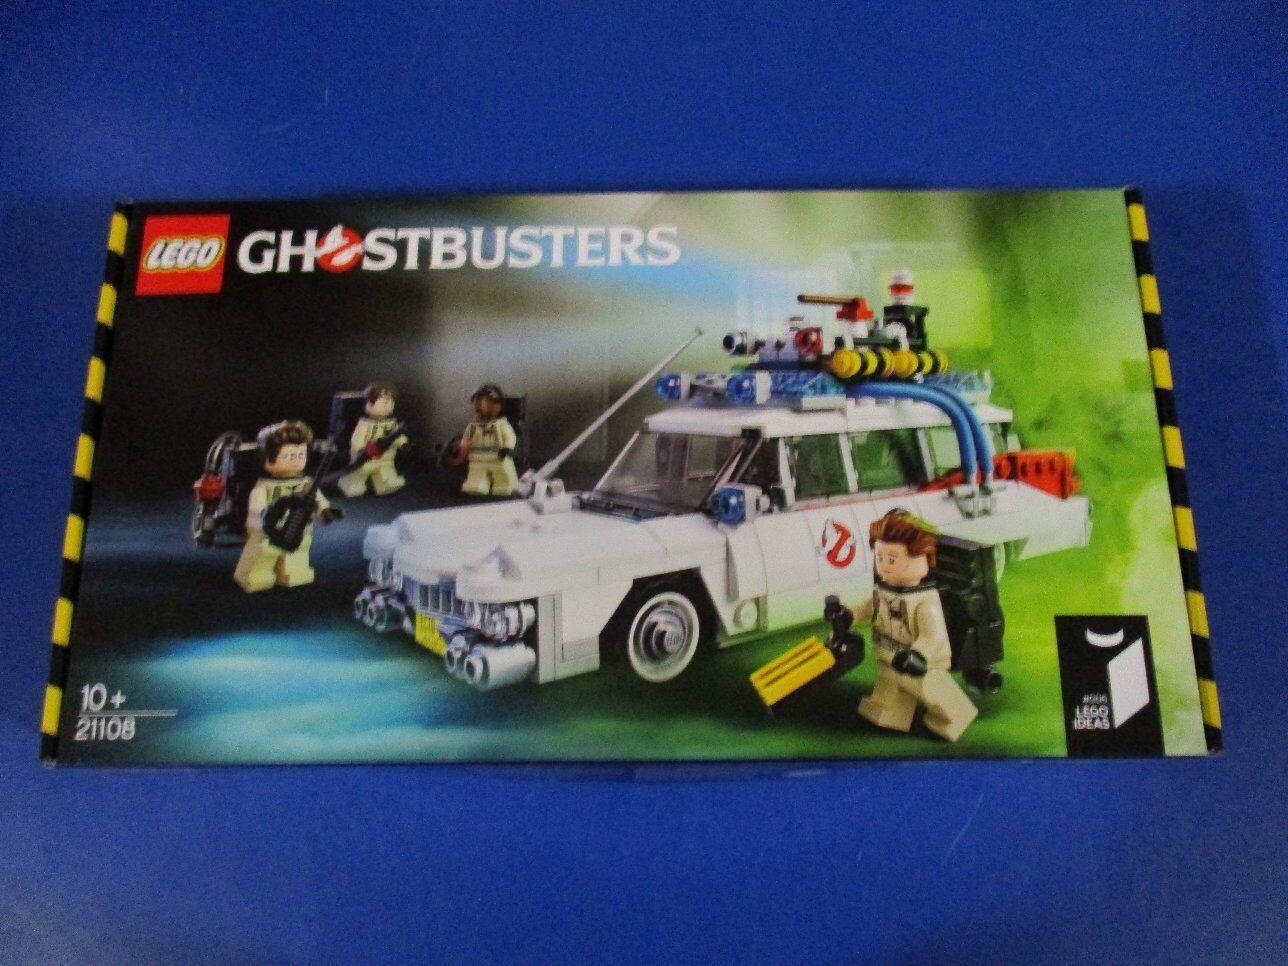 LEGO 21108 Cuusoo Ghostbusters Ecto-1 NEU OVP